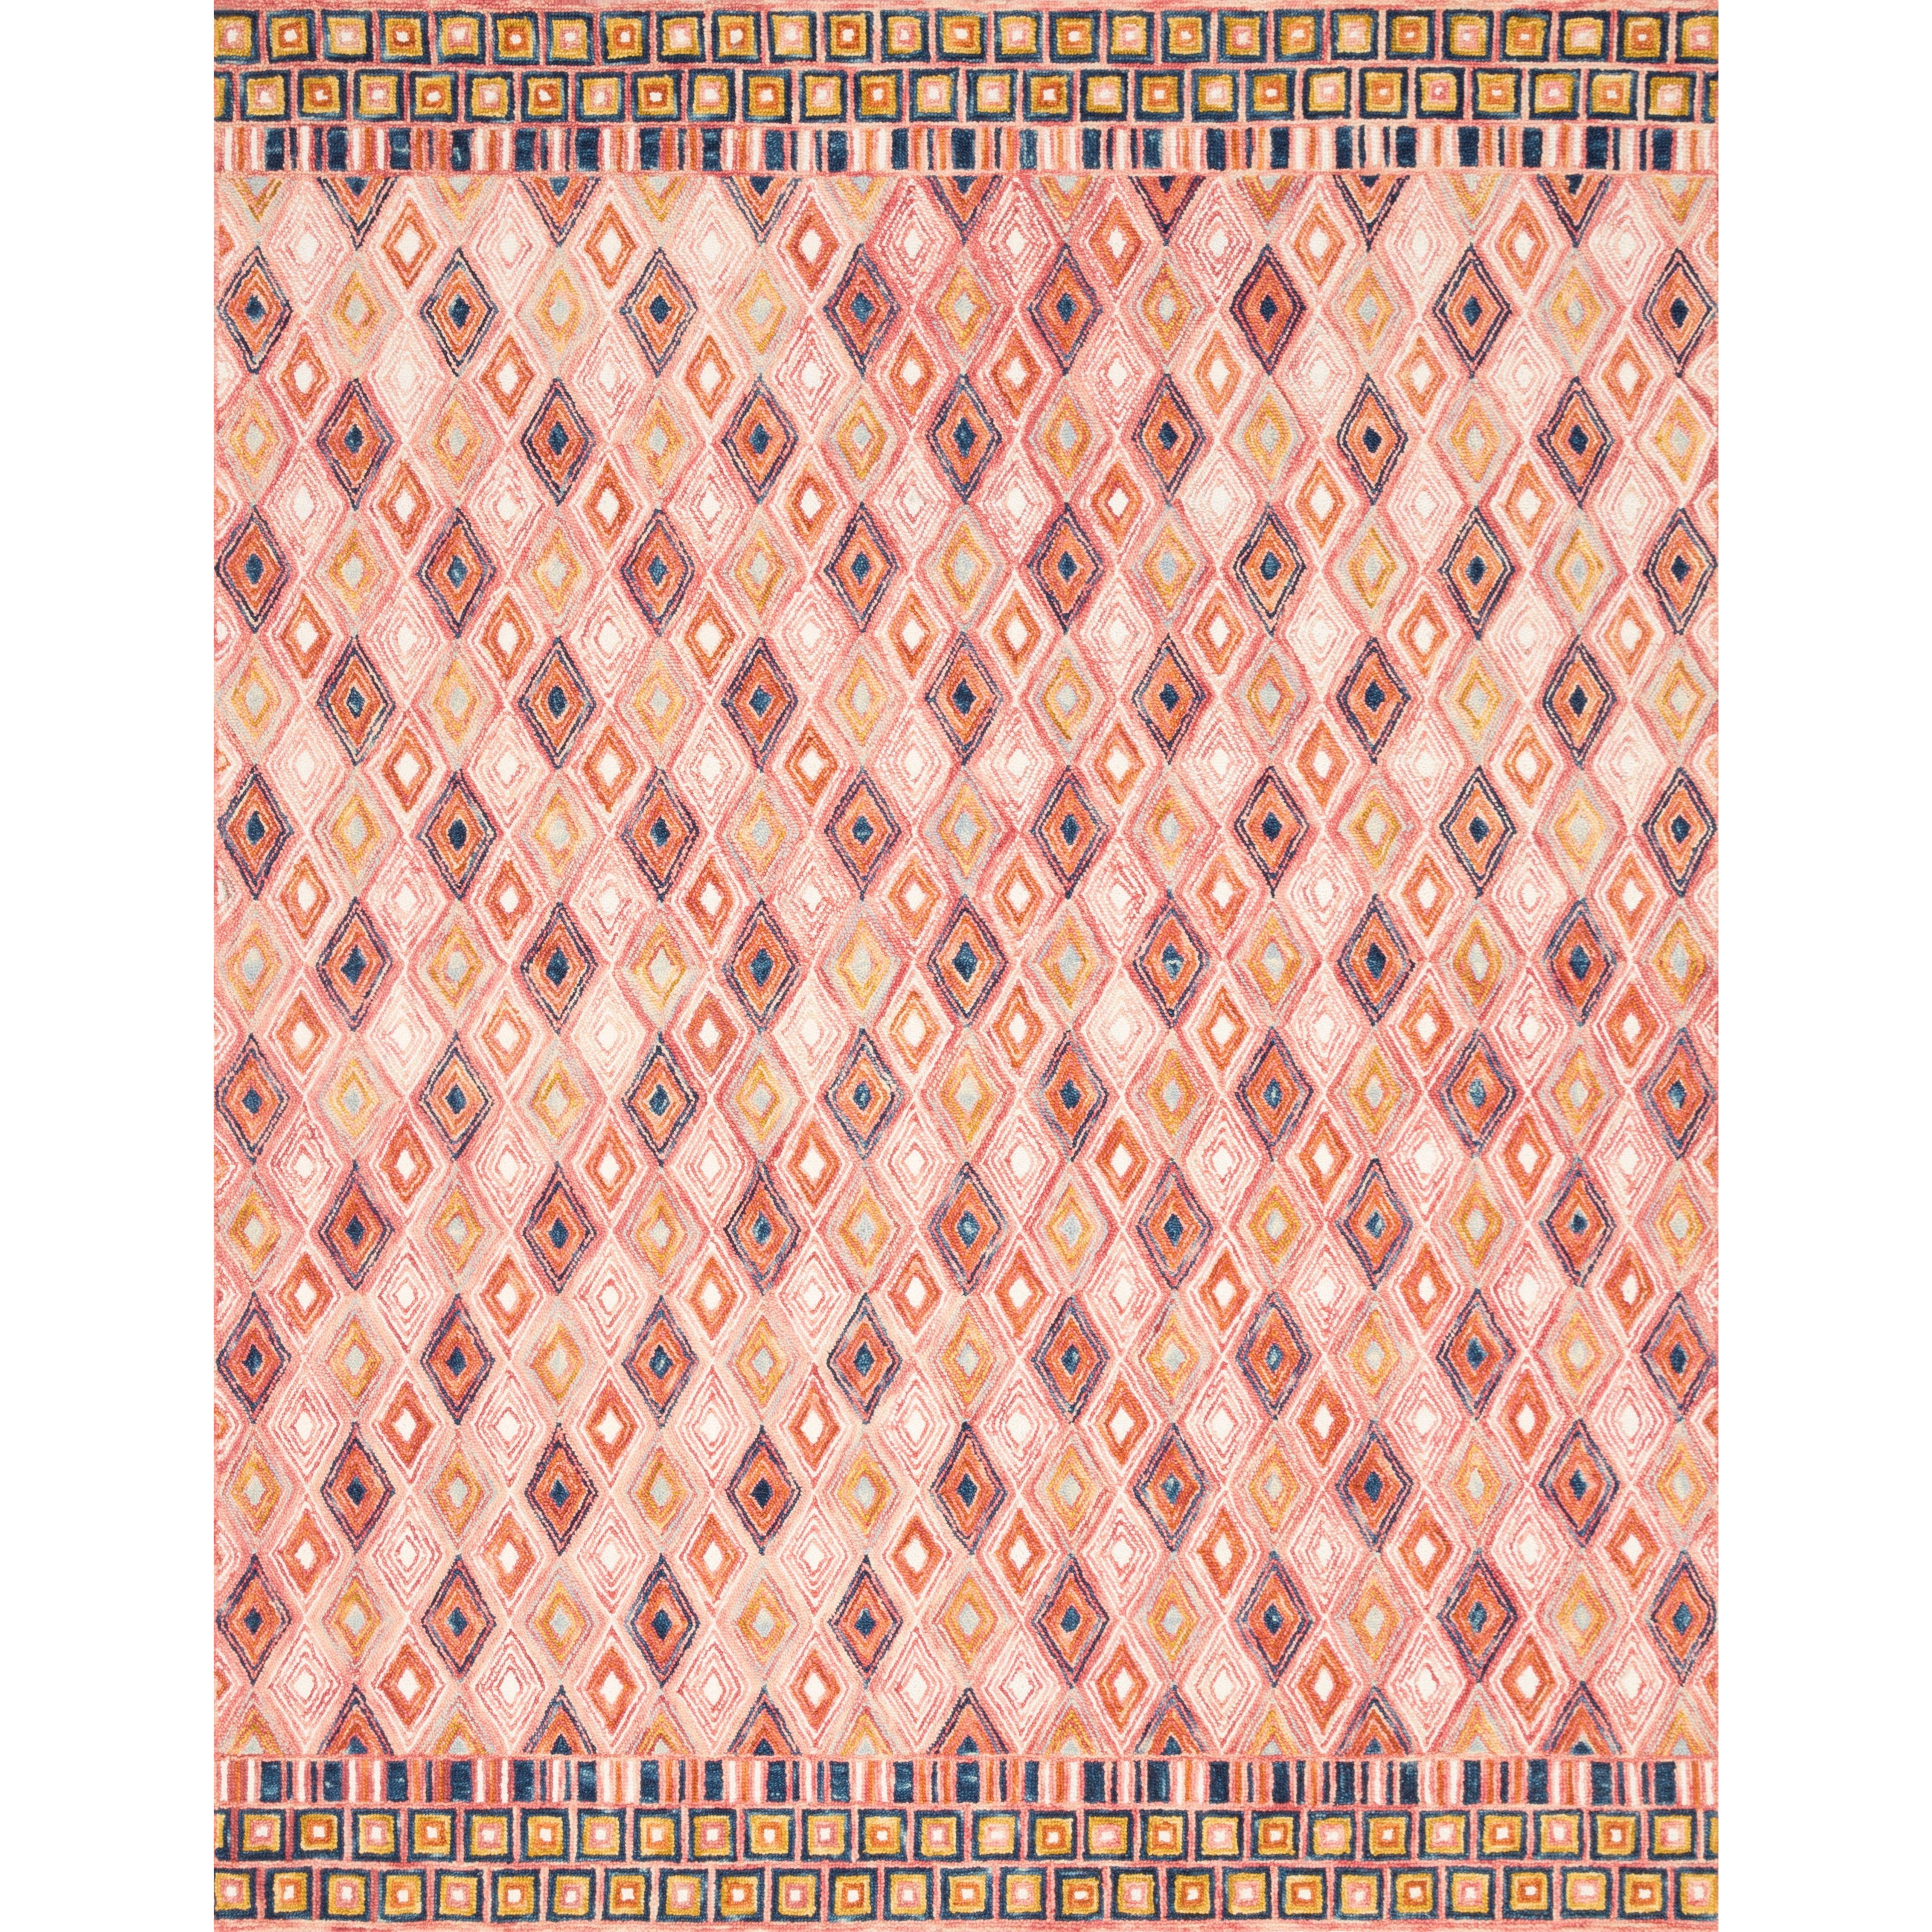 "Priti 2'6"" x 7'6"" Pink / Sunset Rug by Loloi Rugs at Virginia Furniture Market"